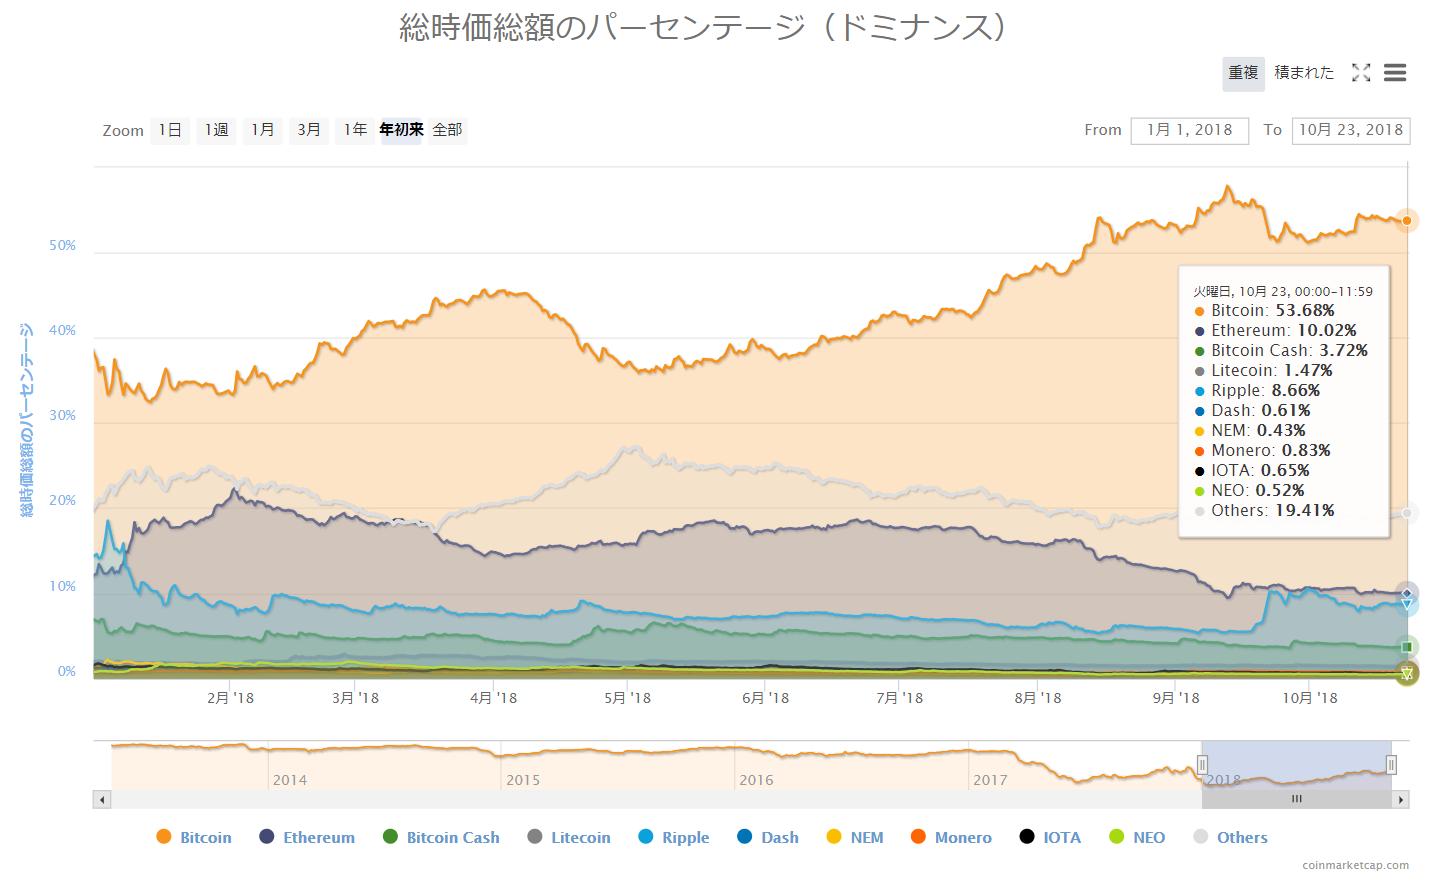 coinmarketcap:ドミナンス定点観測_ほぼ横ばい